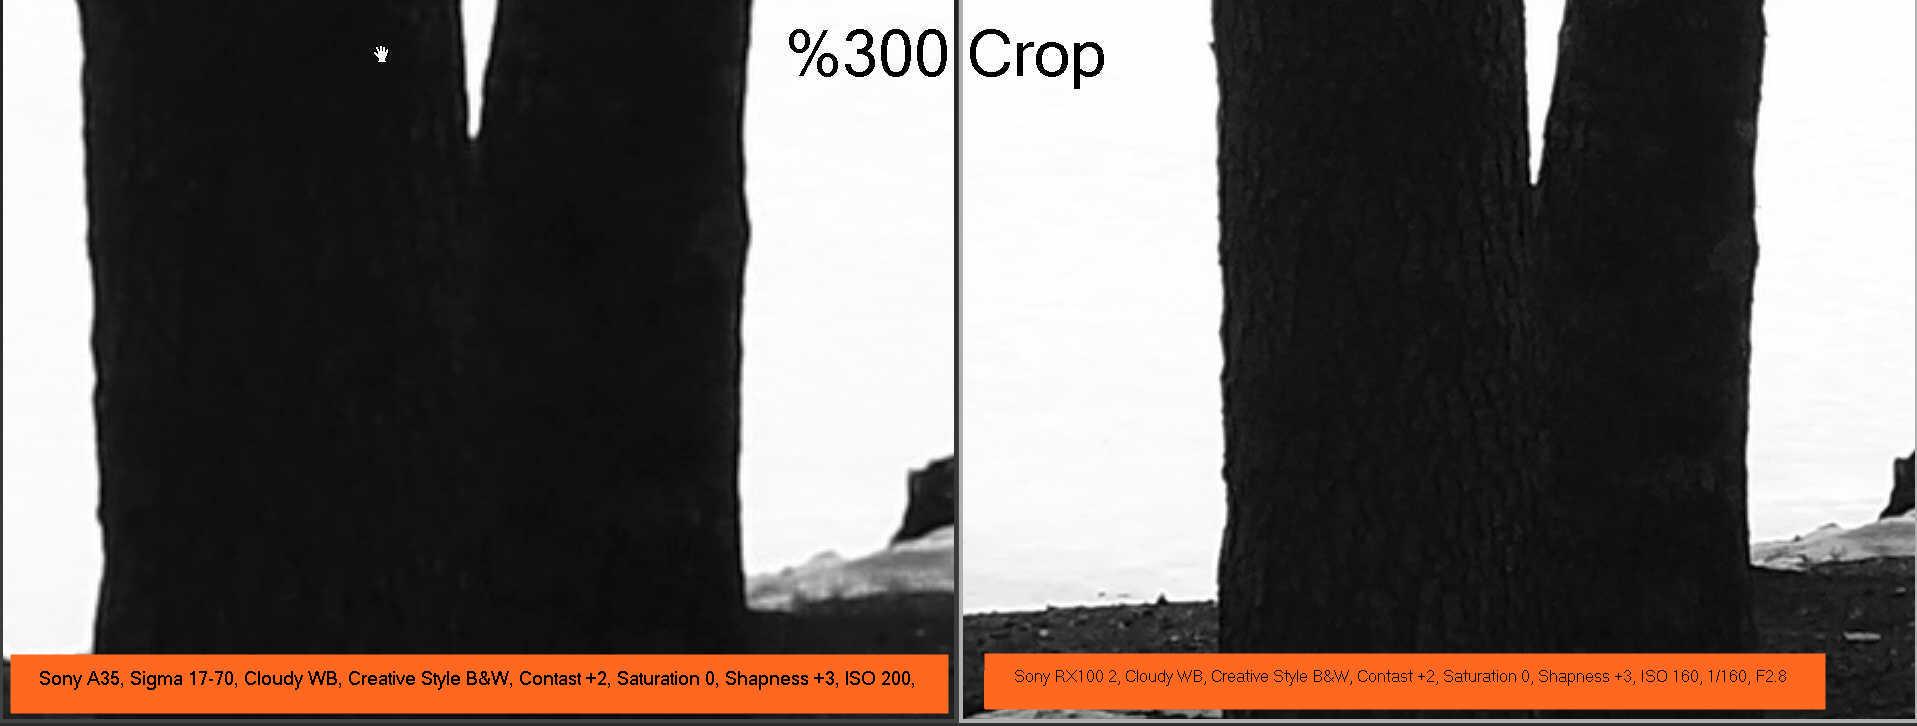 Sony RX100 2 dynamic range